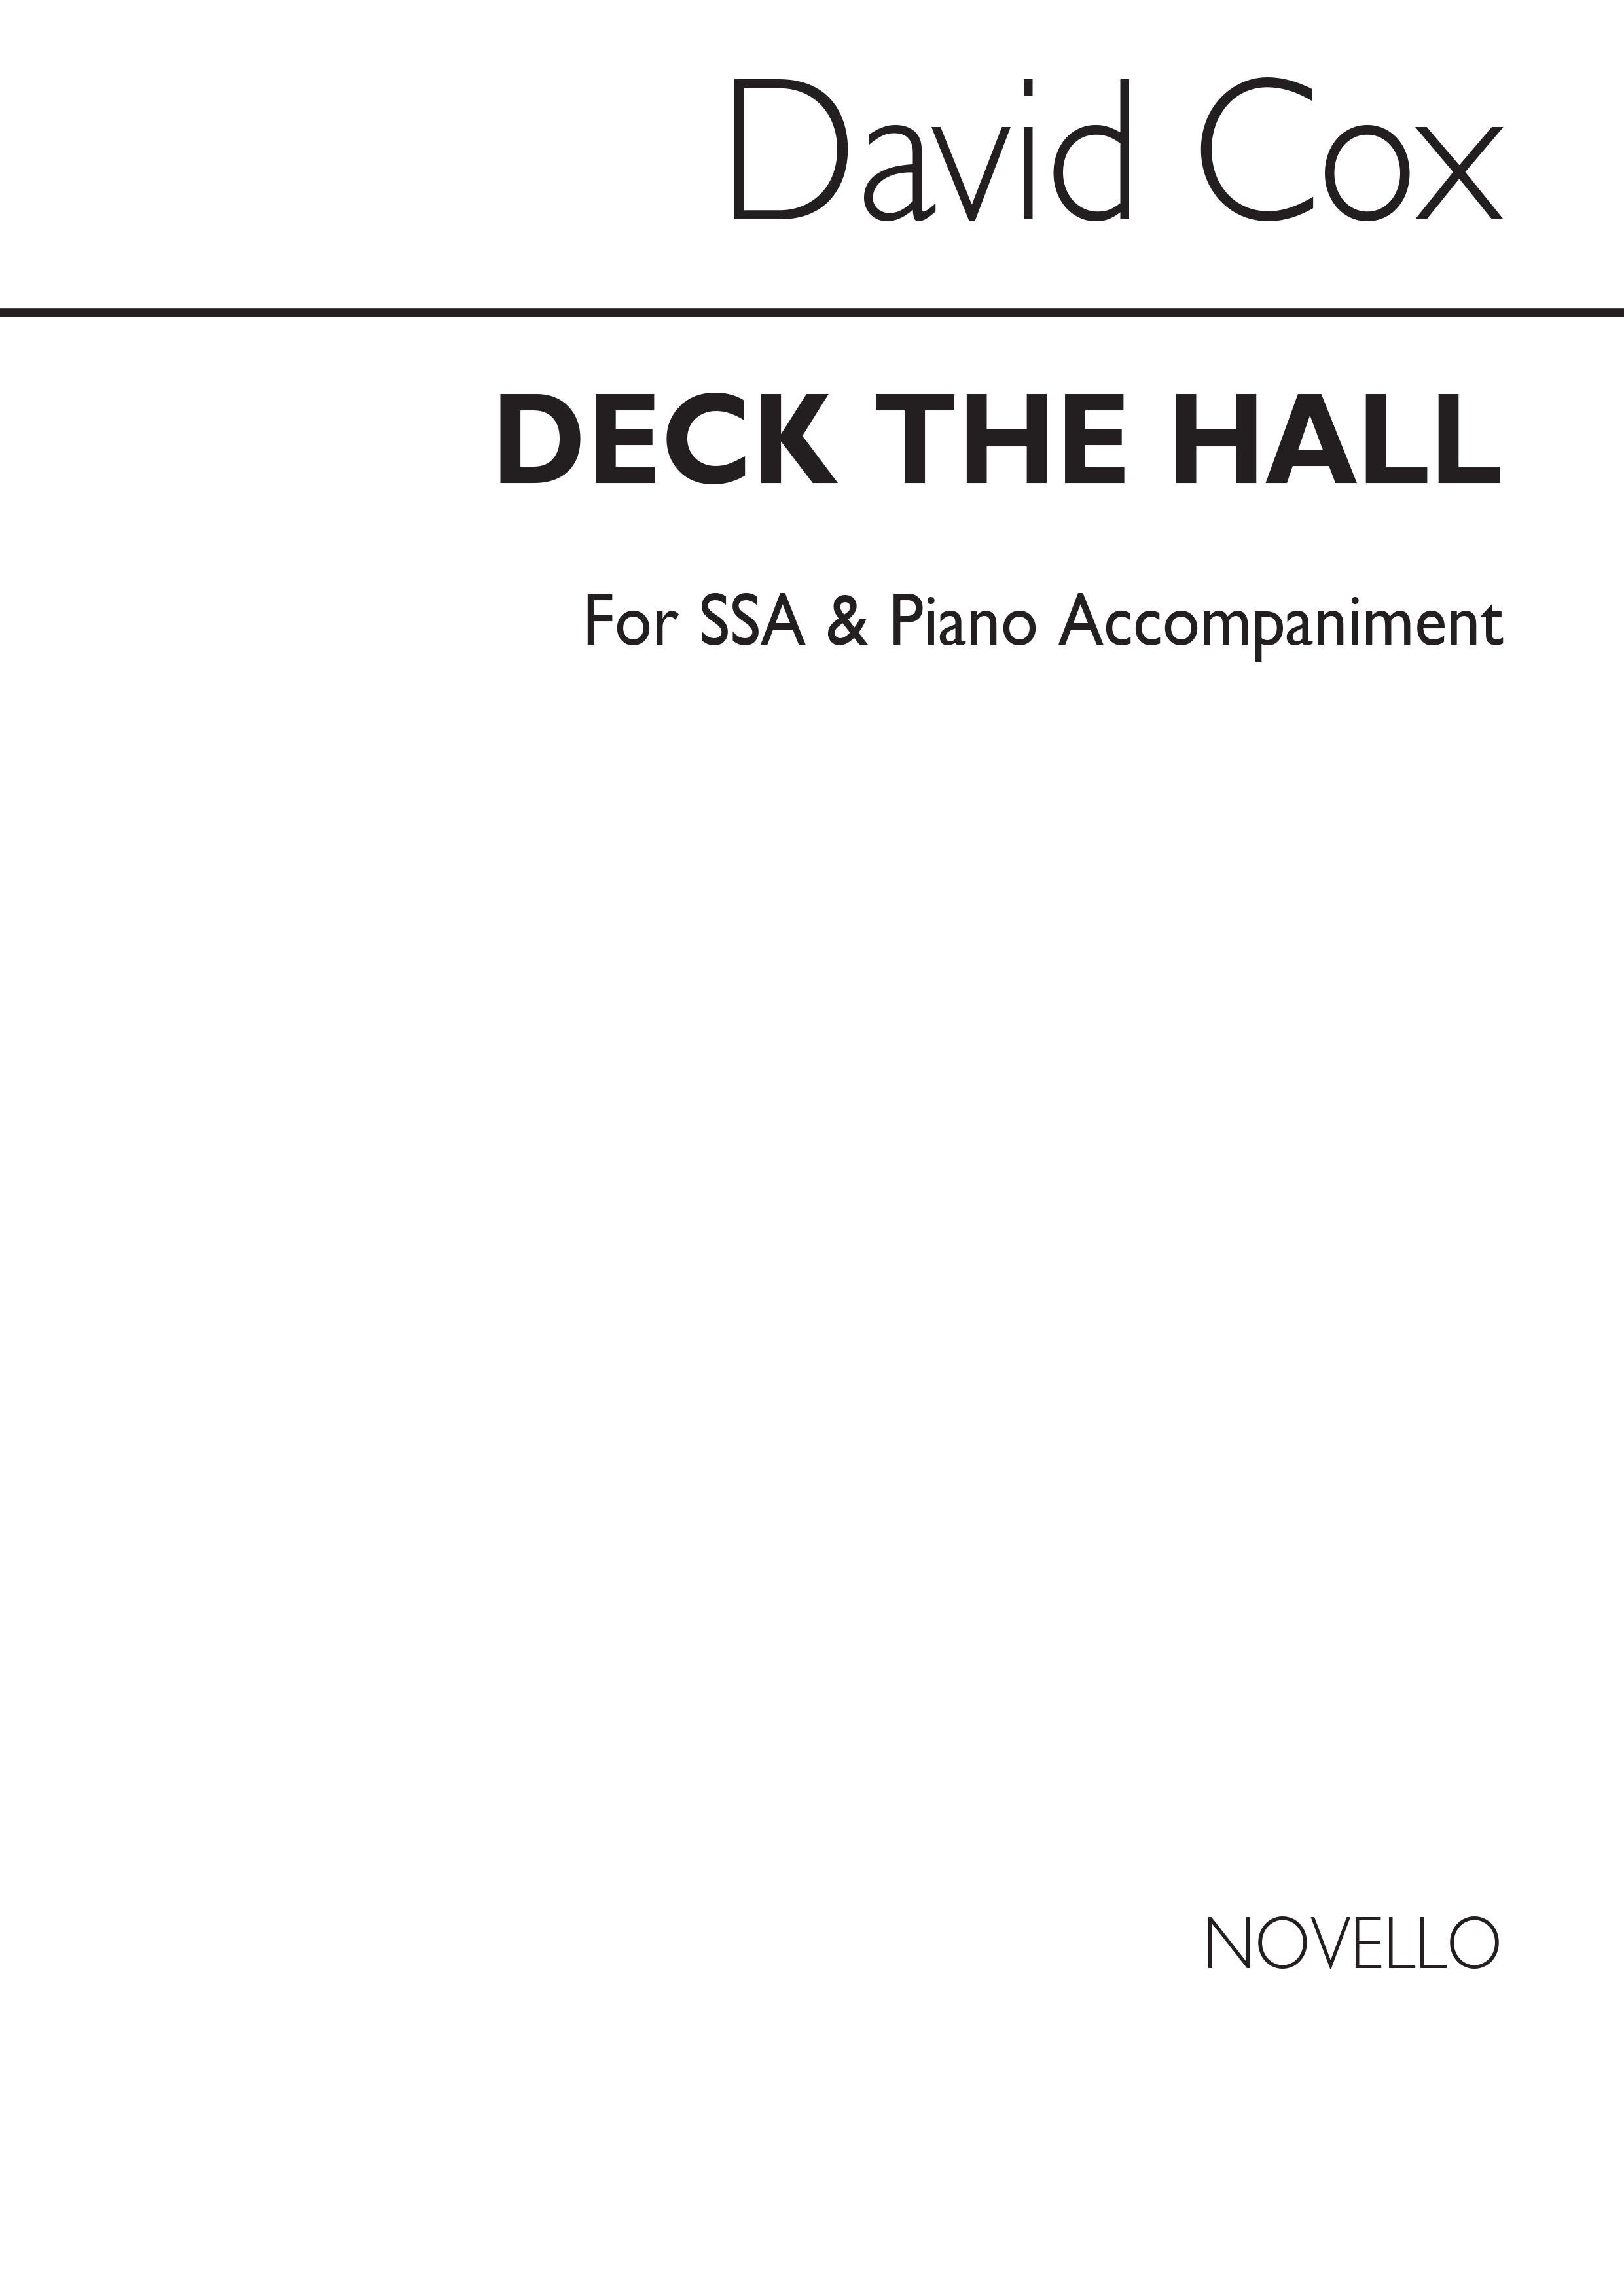 David Cox: David Deck The Halls Ssa/Pf: SSA: Vocal Score